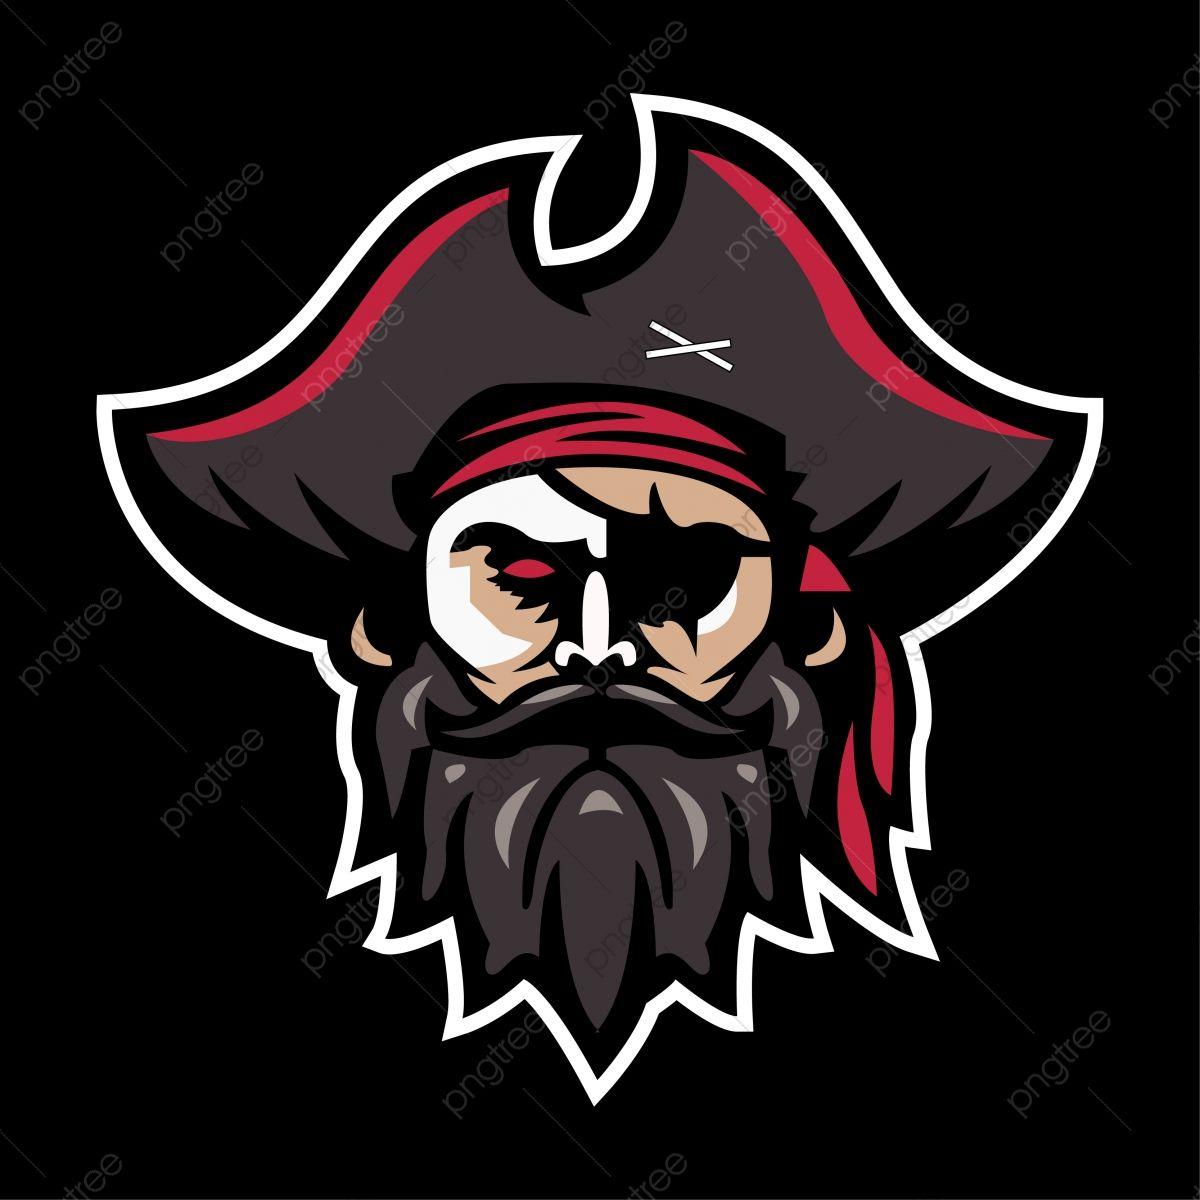 25 Amazing Pirates Logos Skull Logo Halloween Logo Graphic Design Logo